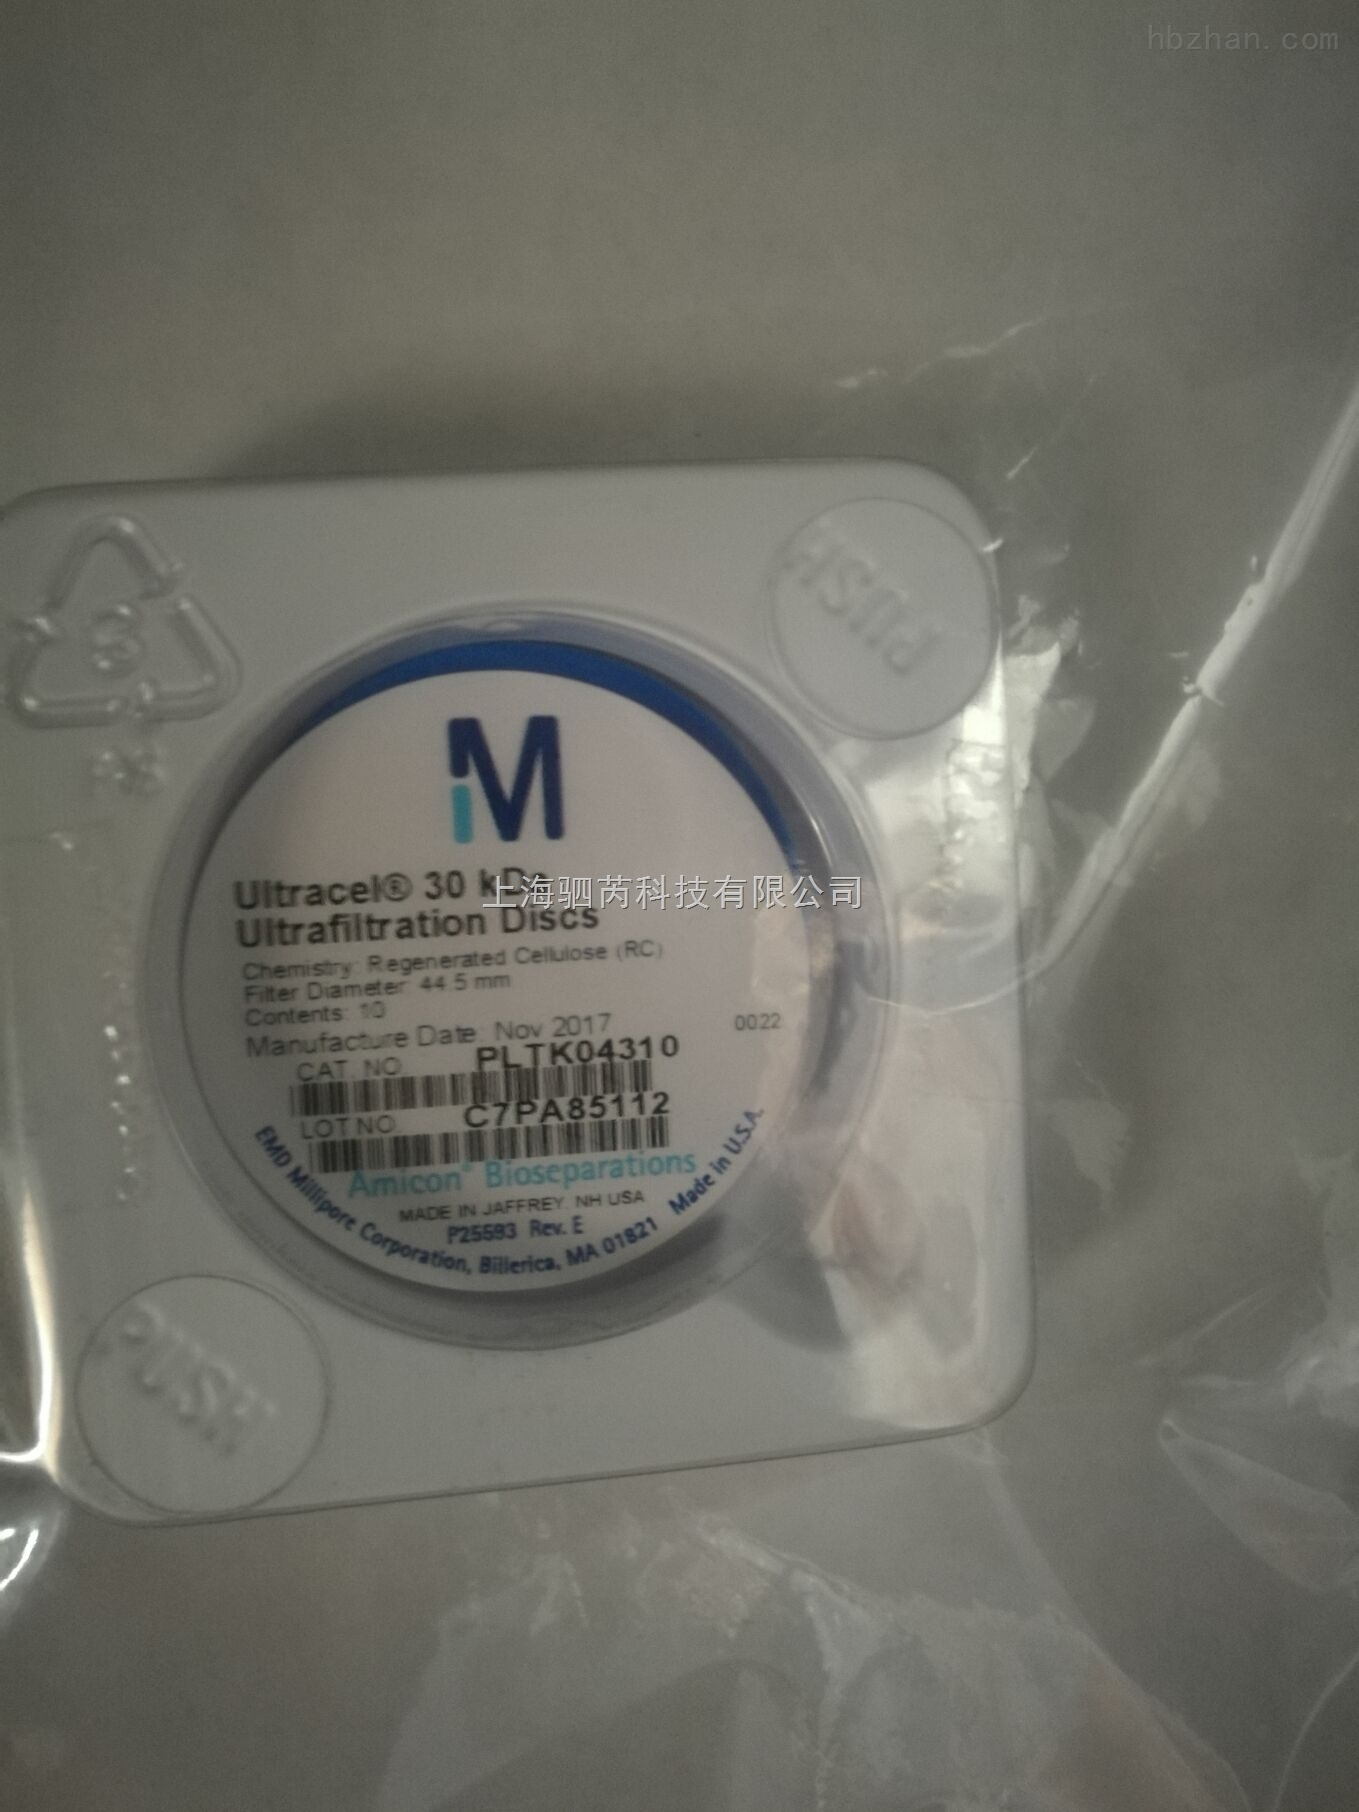 Ultracel 30K再生纤维素超滤膜PLTK04310